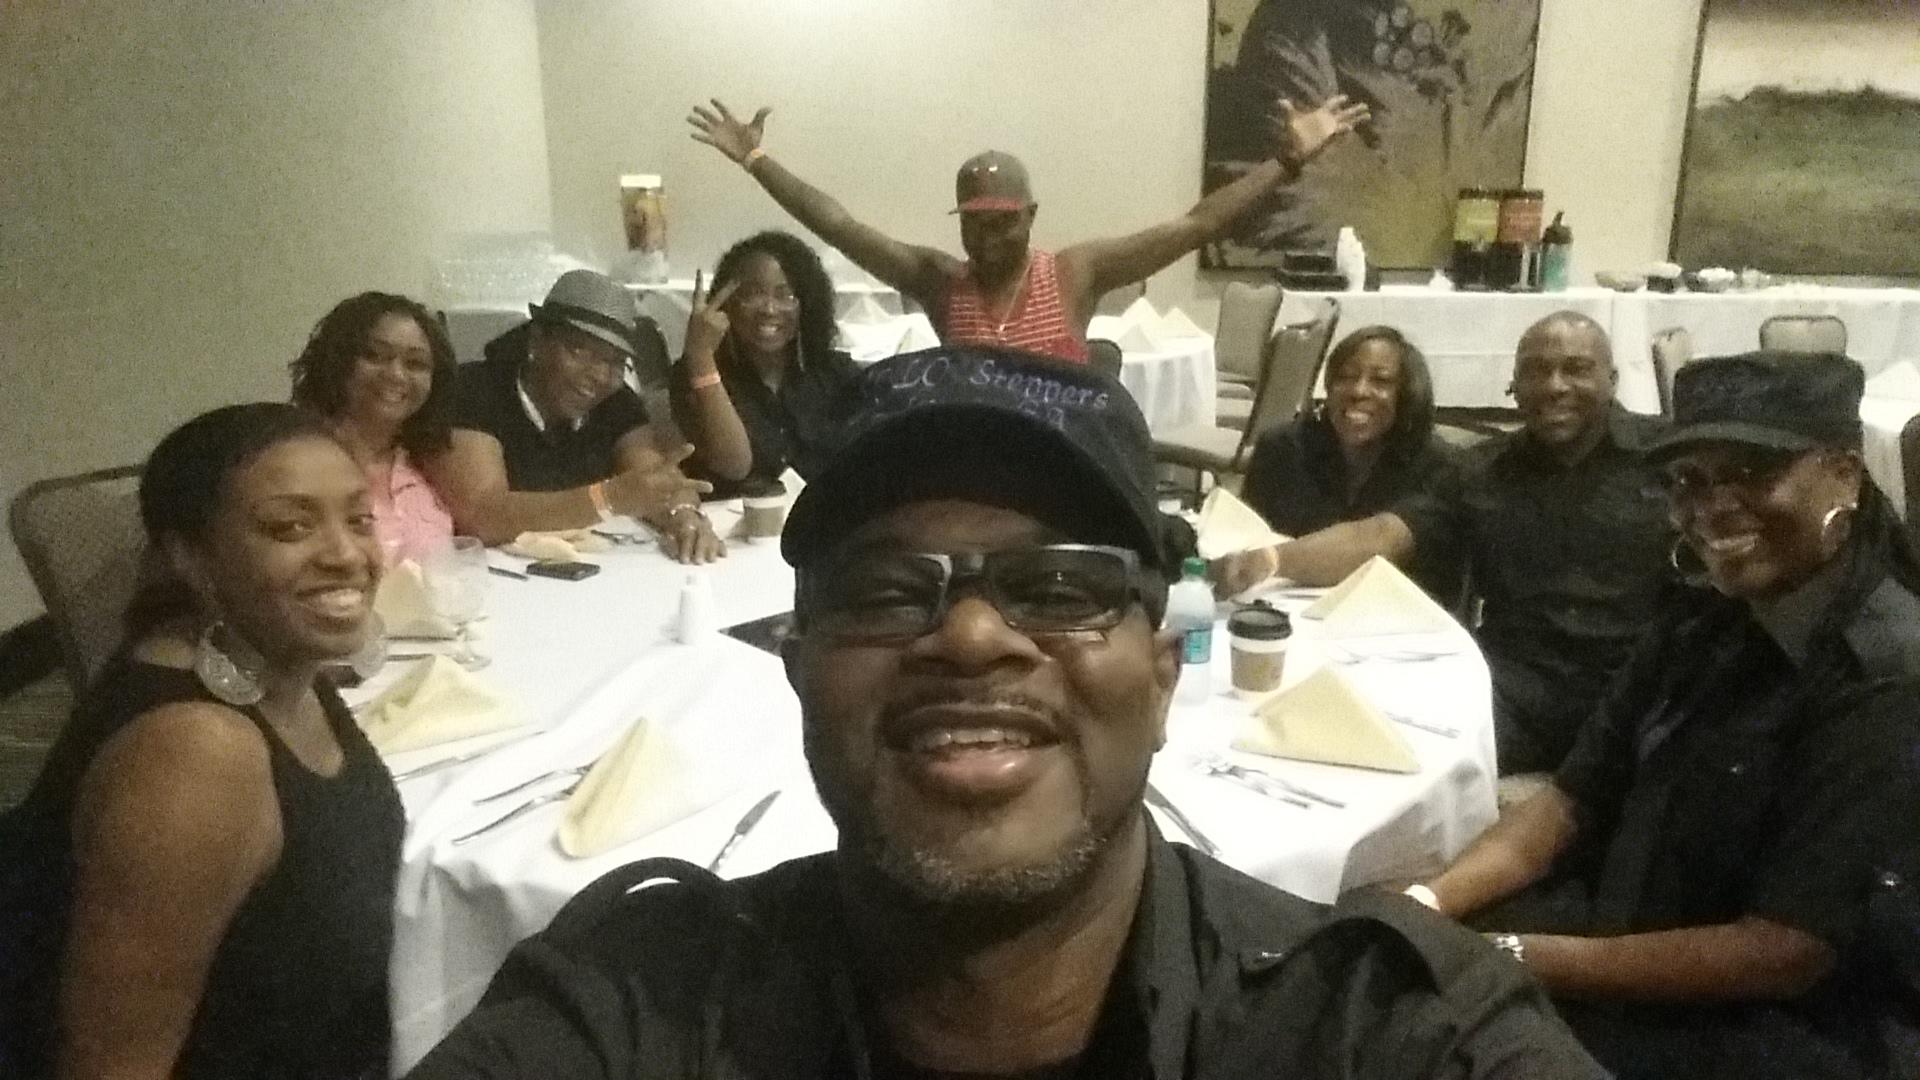 Yolo_Family_Selfie_NC